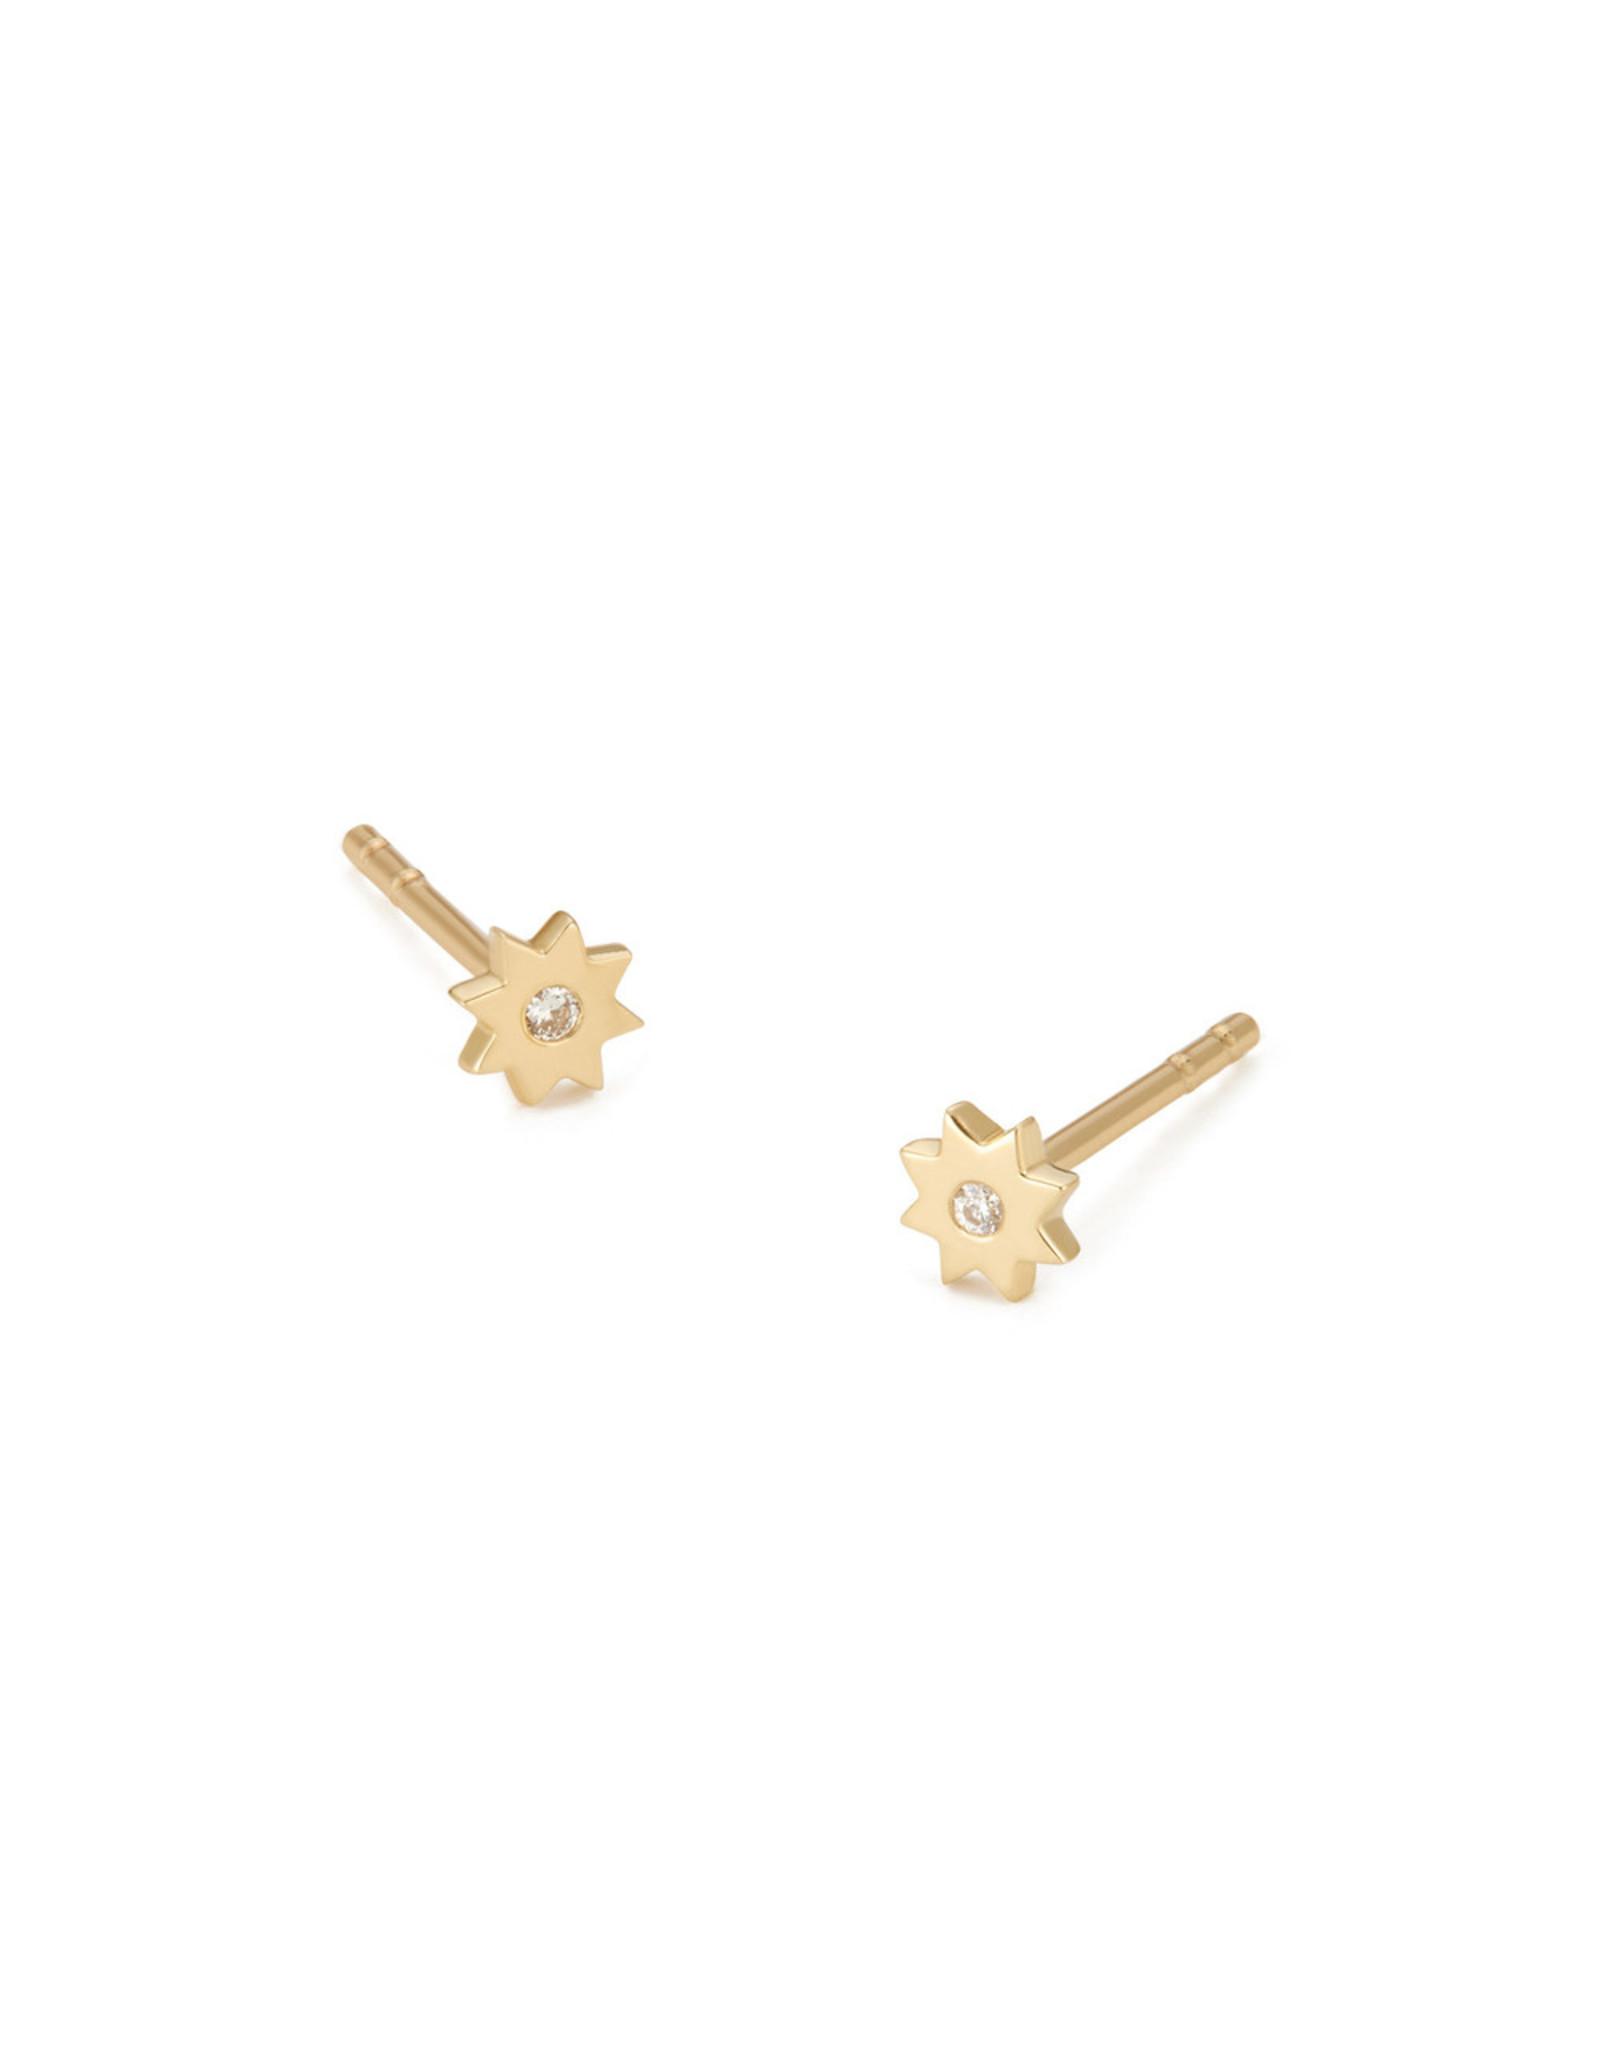 Bondeye Jewelry Bondeye Ursa Earrings (Color: Yellow Gold / White Diamond)